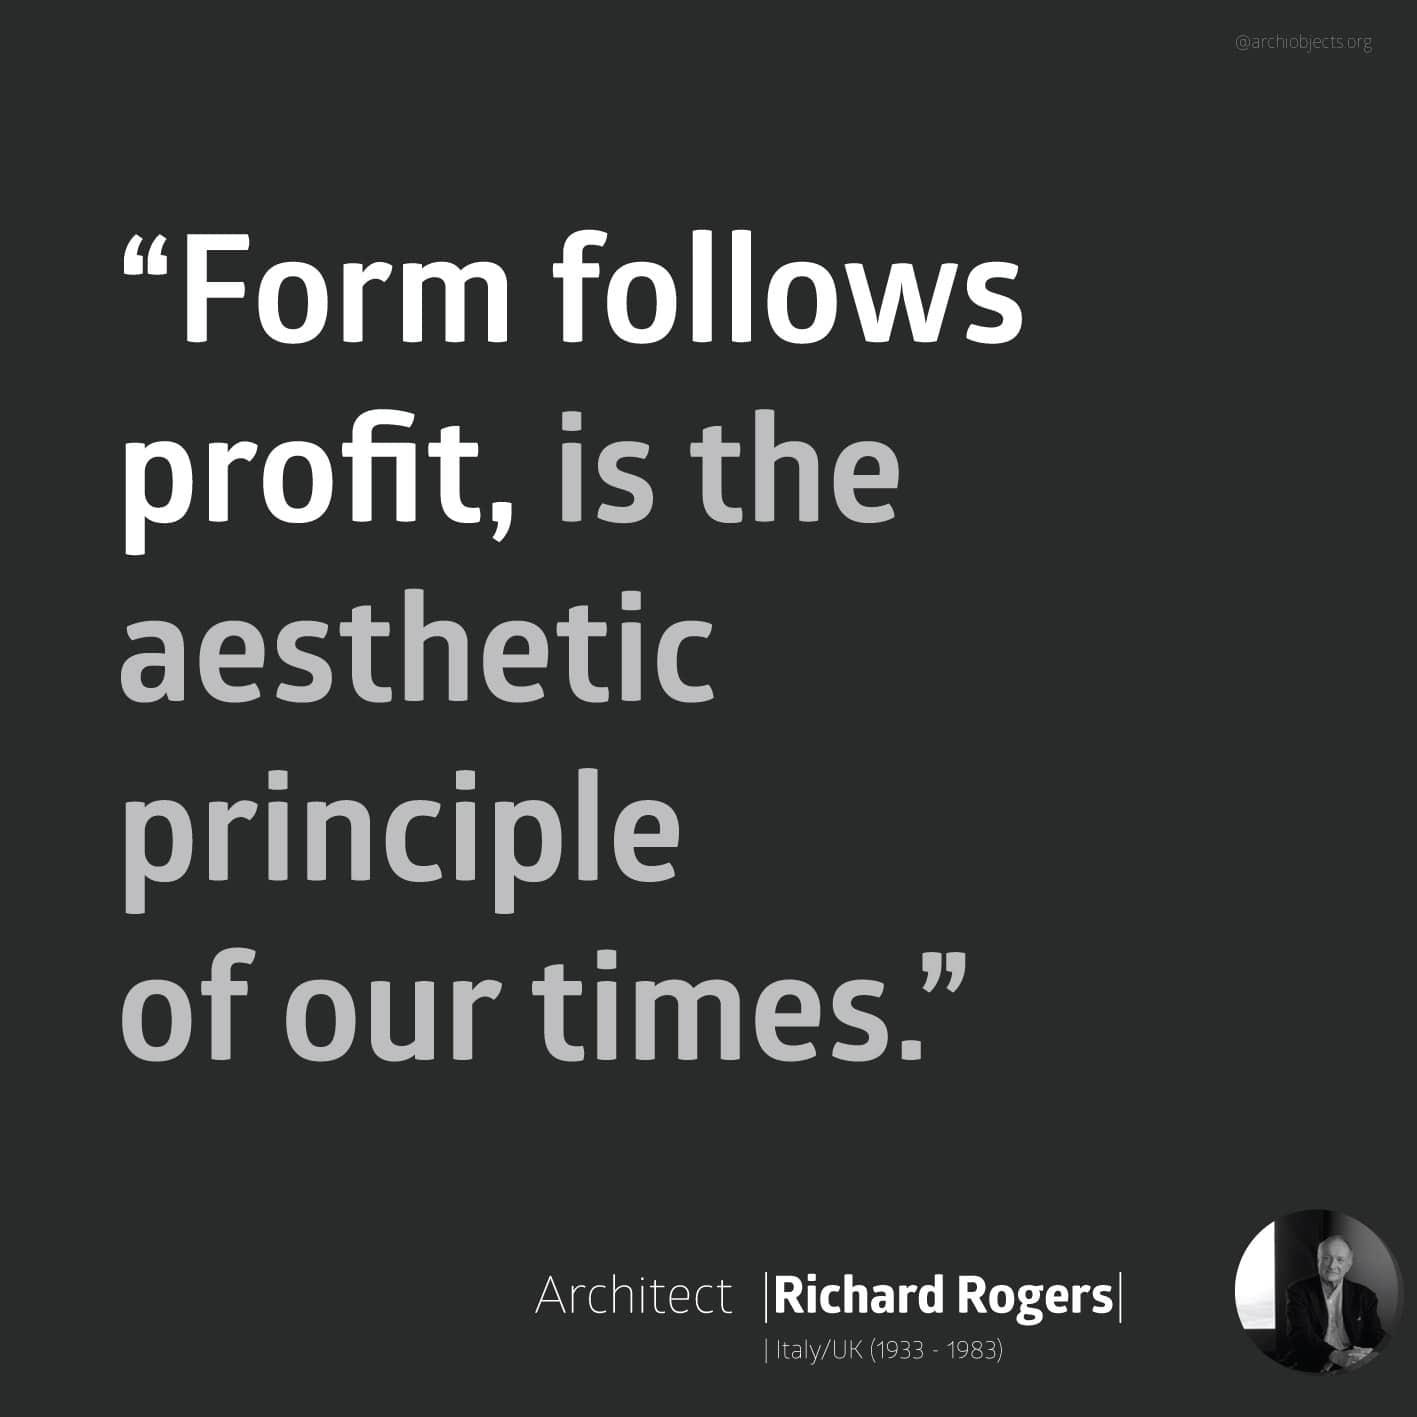 richard rogers quote